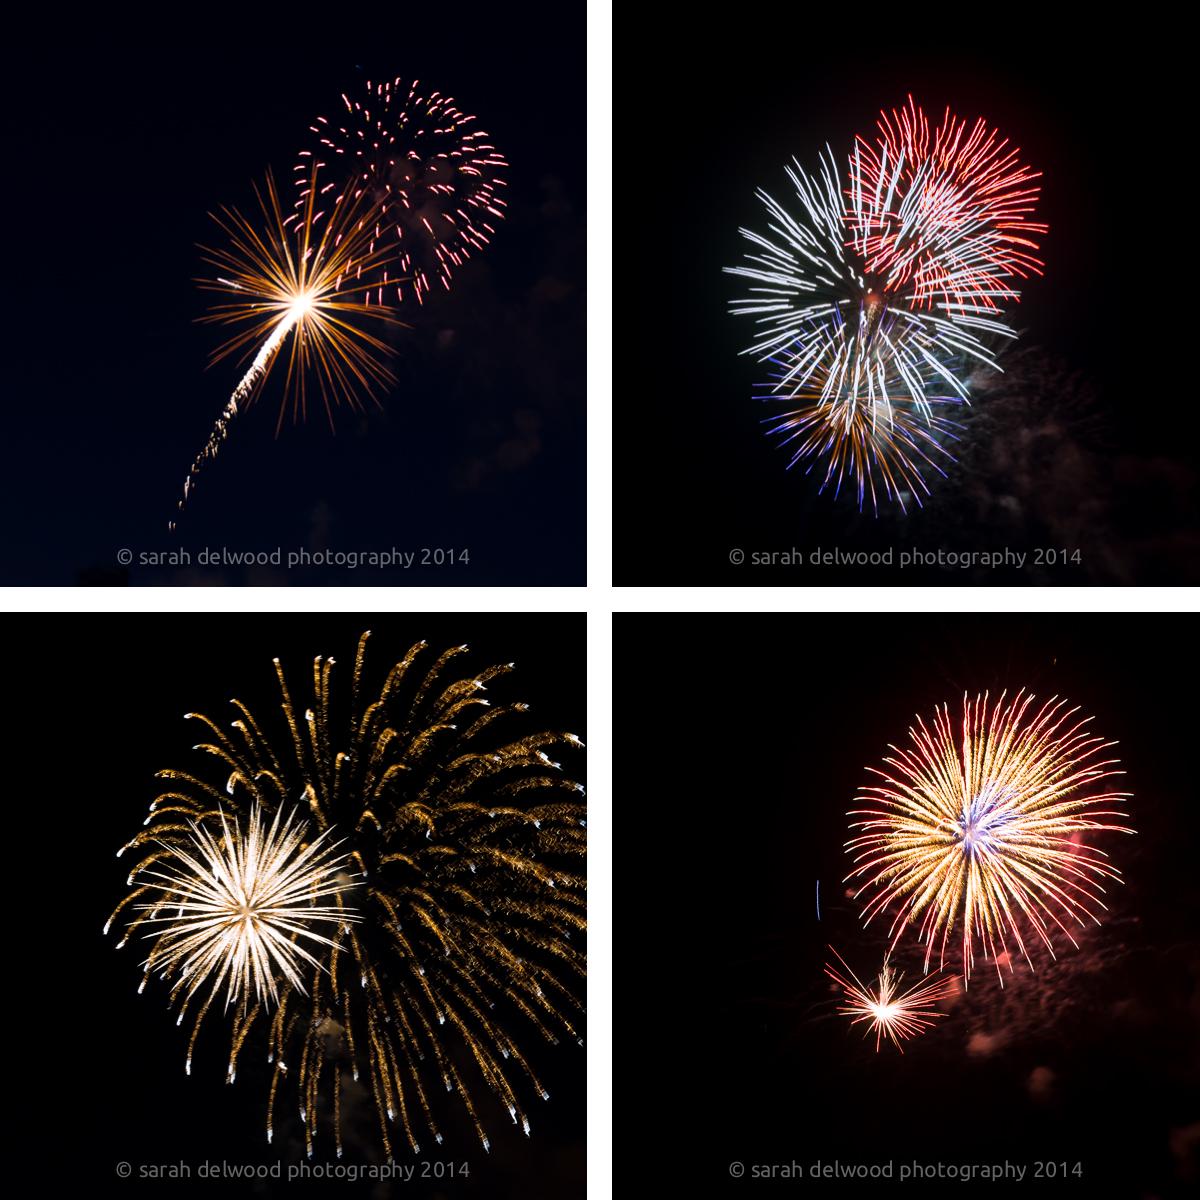 san jose fireworks landscape natural light with sarah delwood photography